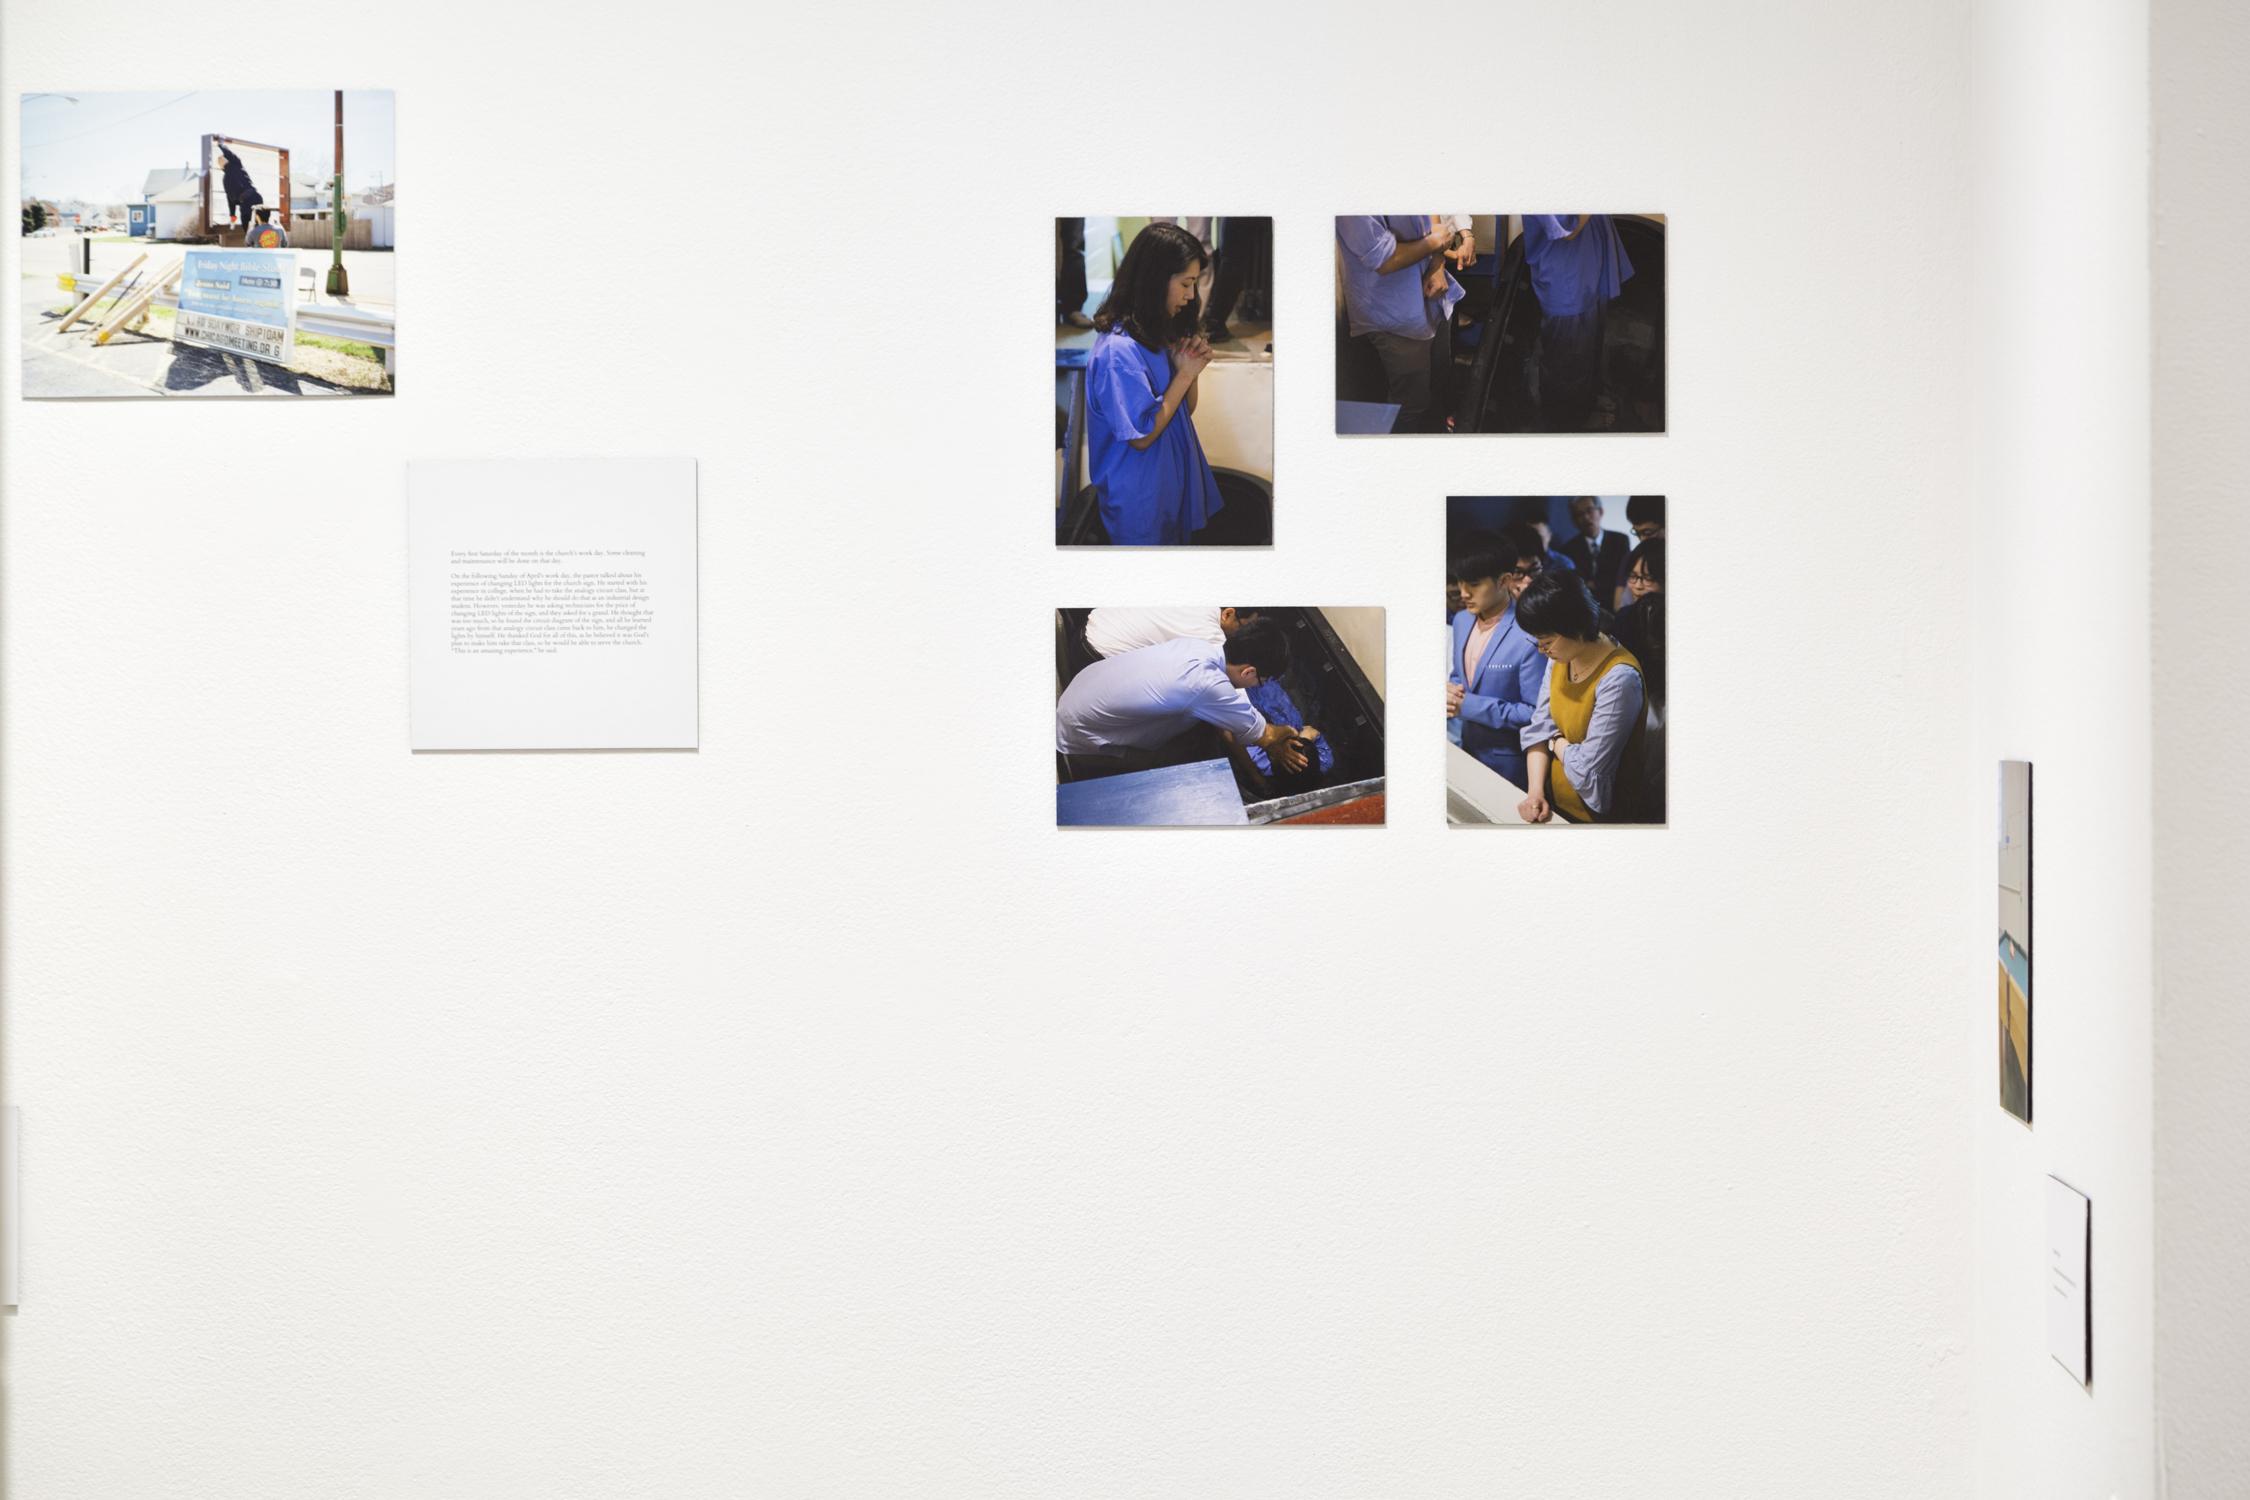 SAIC Fall BFA Show, Sullivan Gallery, Chicago, USA